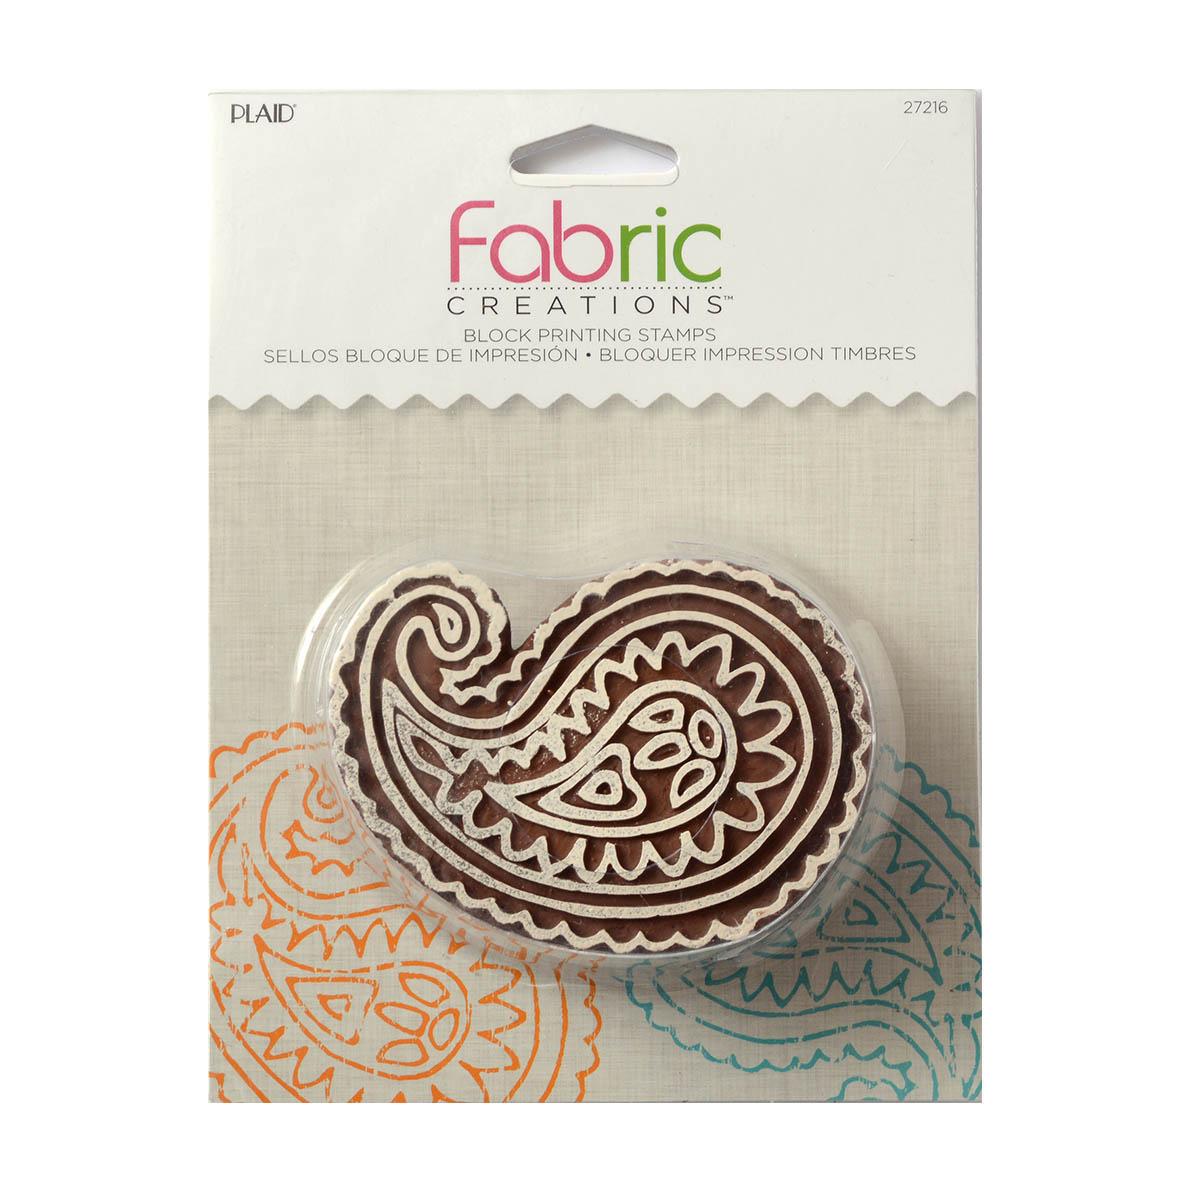 Fabric Creations™ Block Printing Stamps - Medium - Paisley